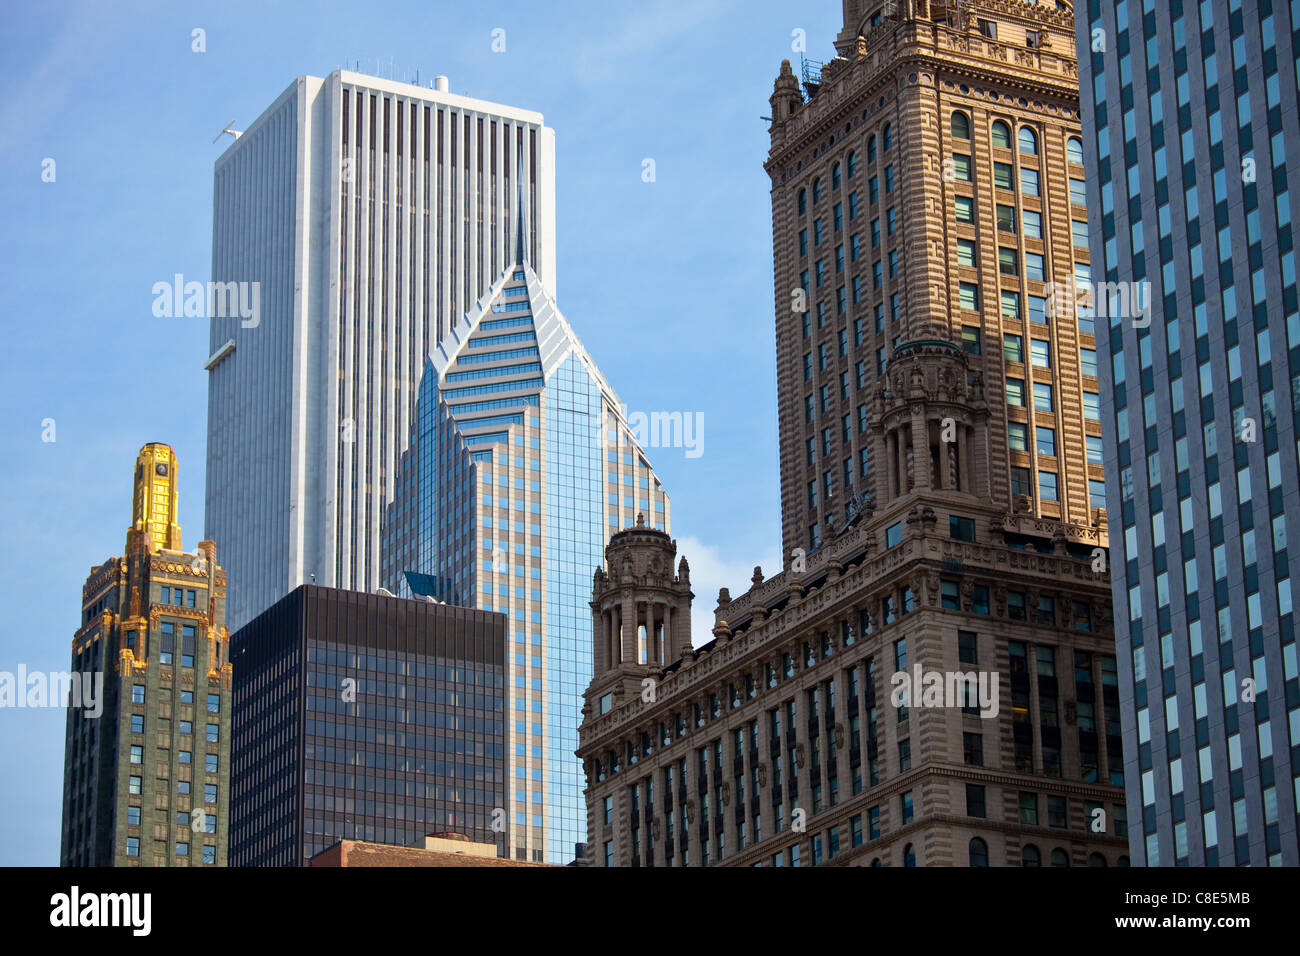 Skyline, Chicago, Illinois - Stock Image